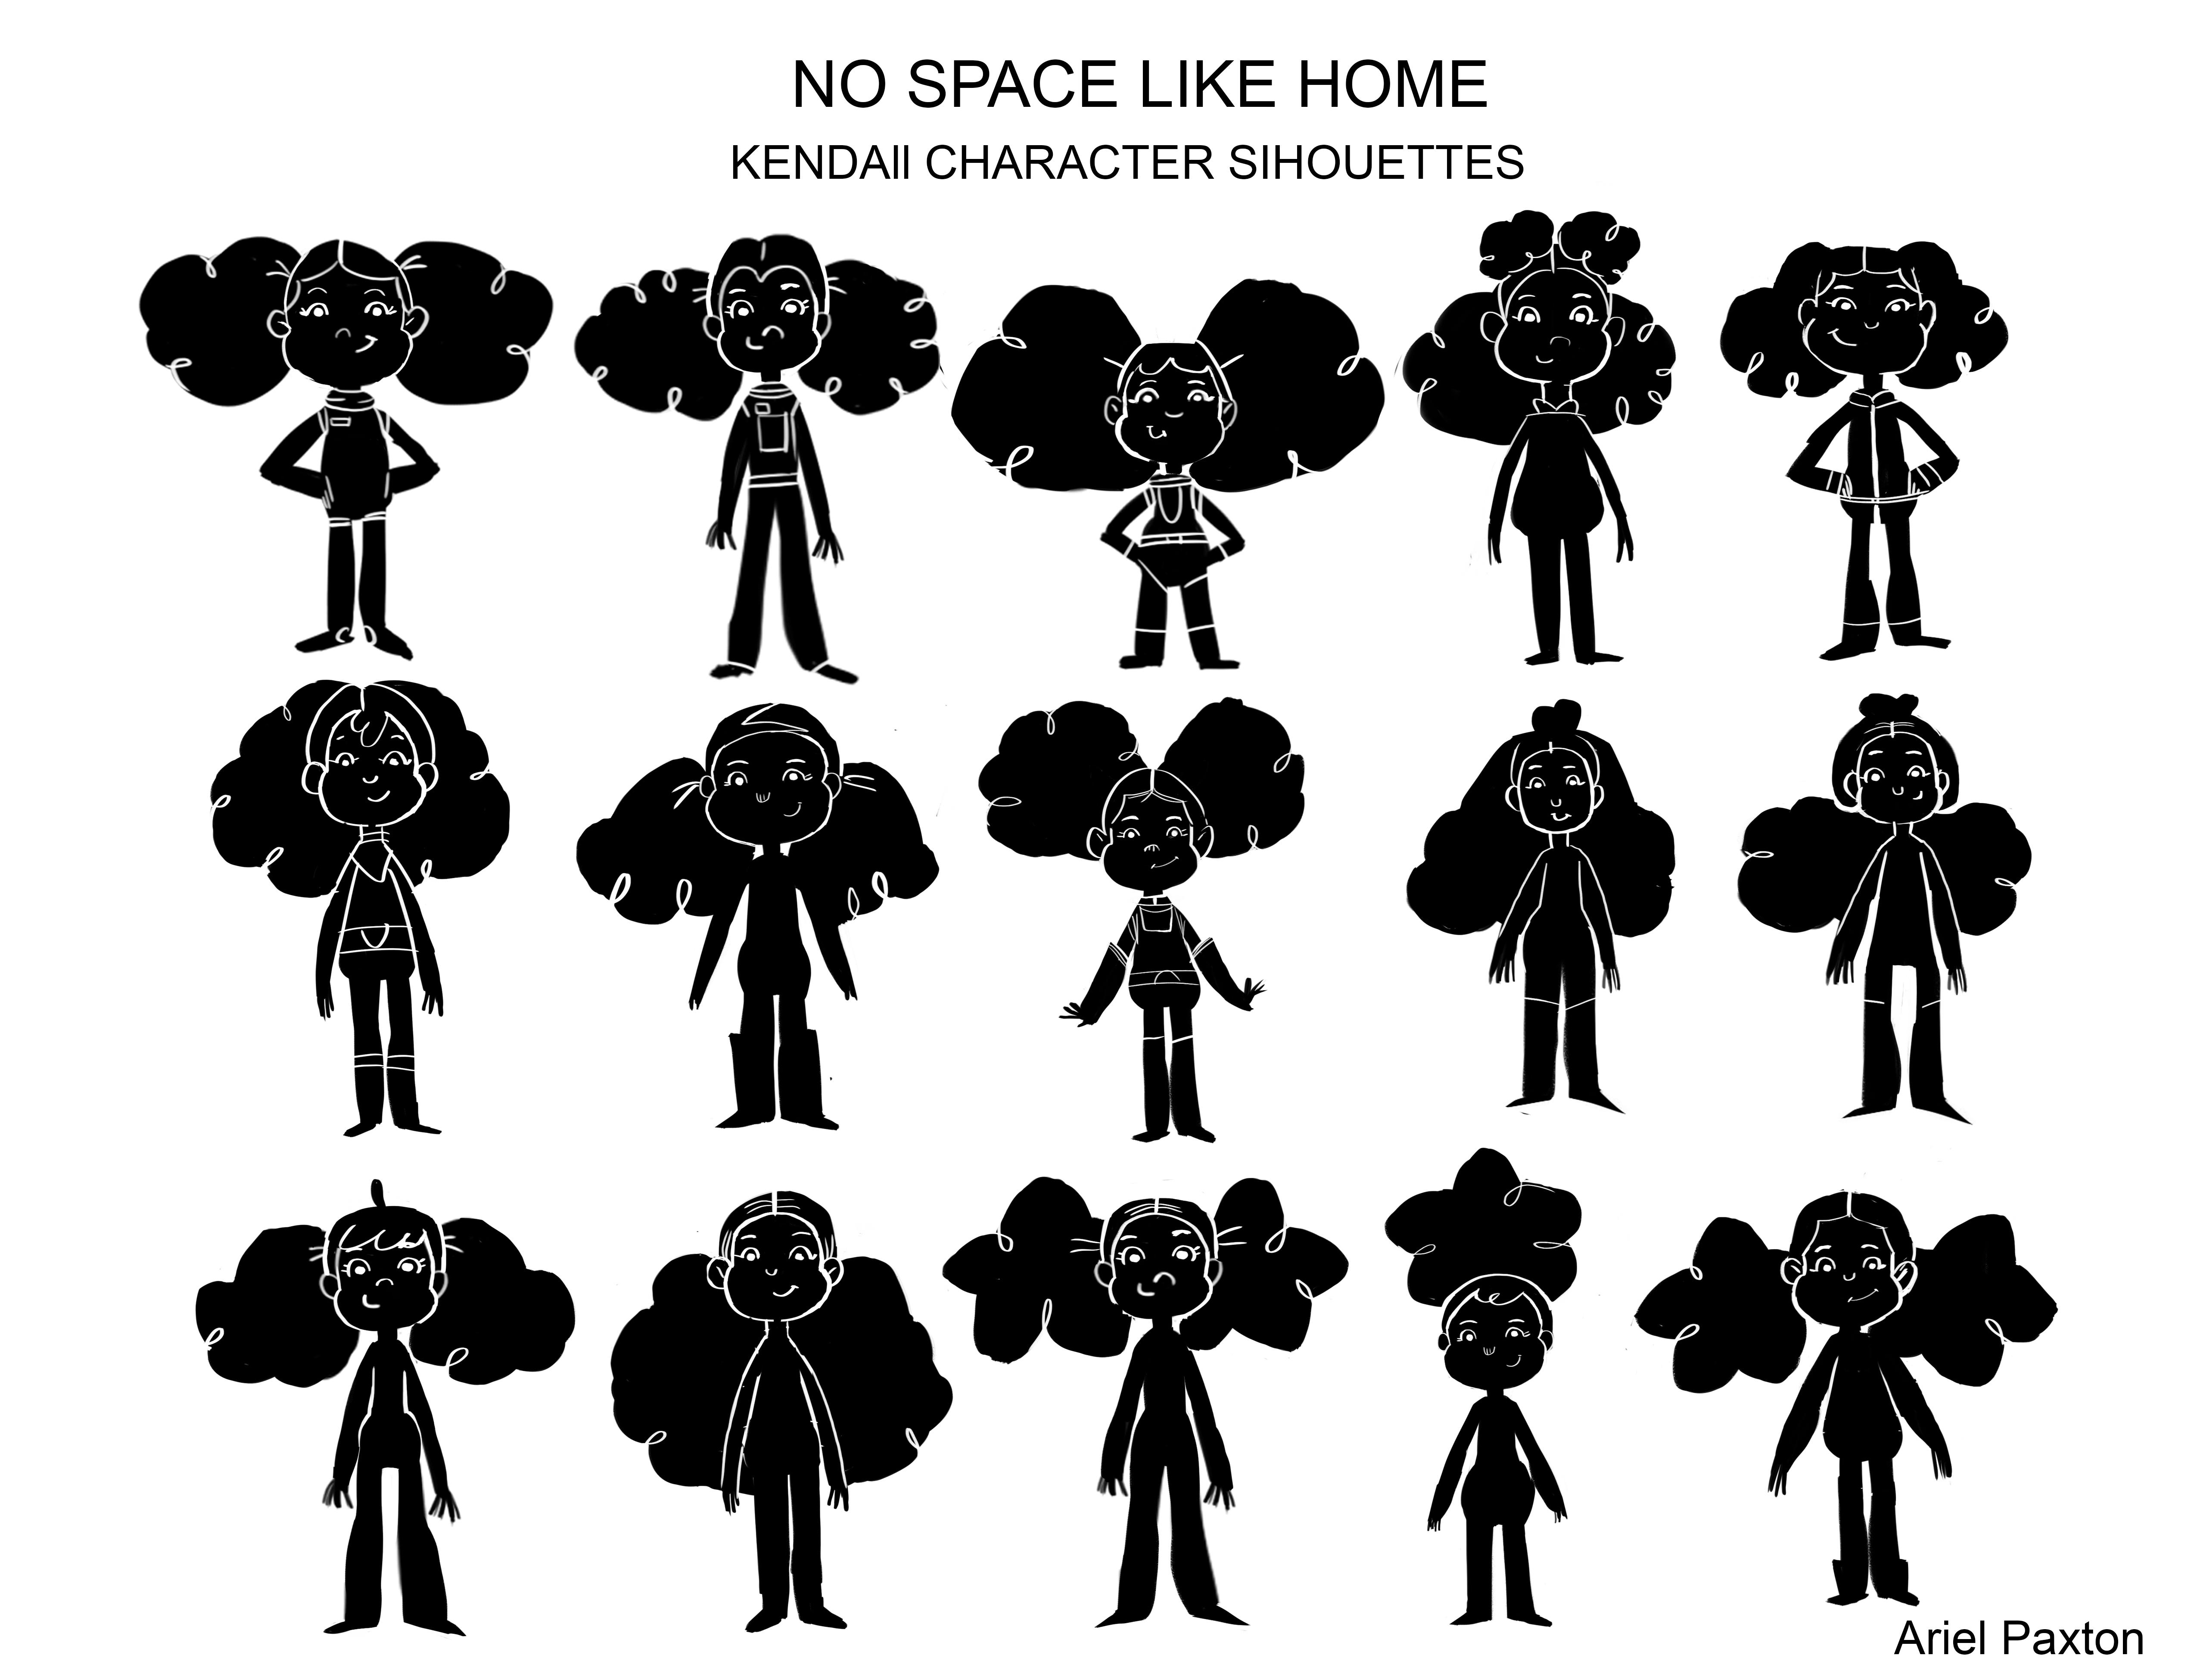 No Space Like Home Girl Silhouette